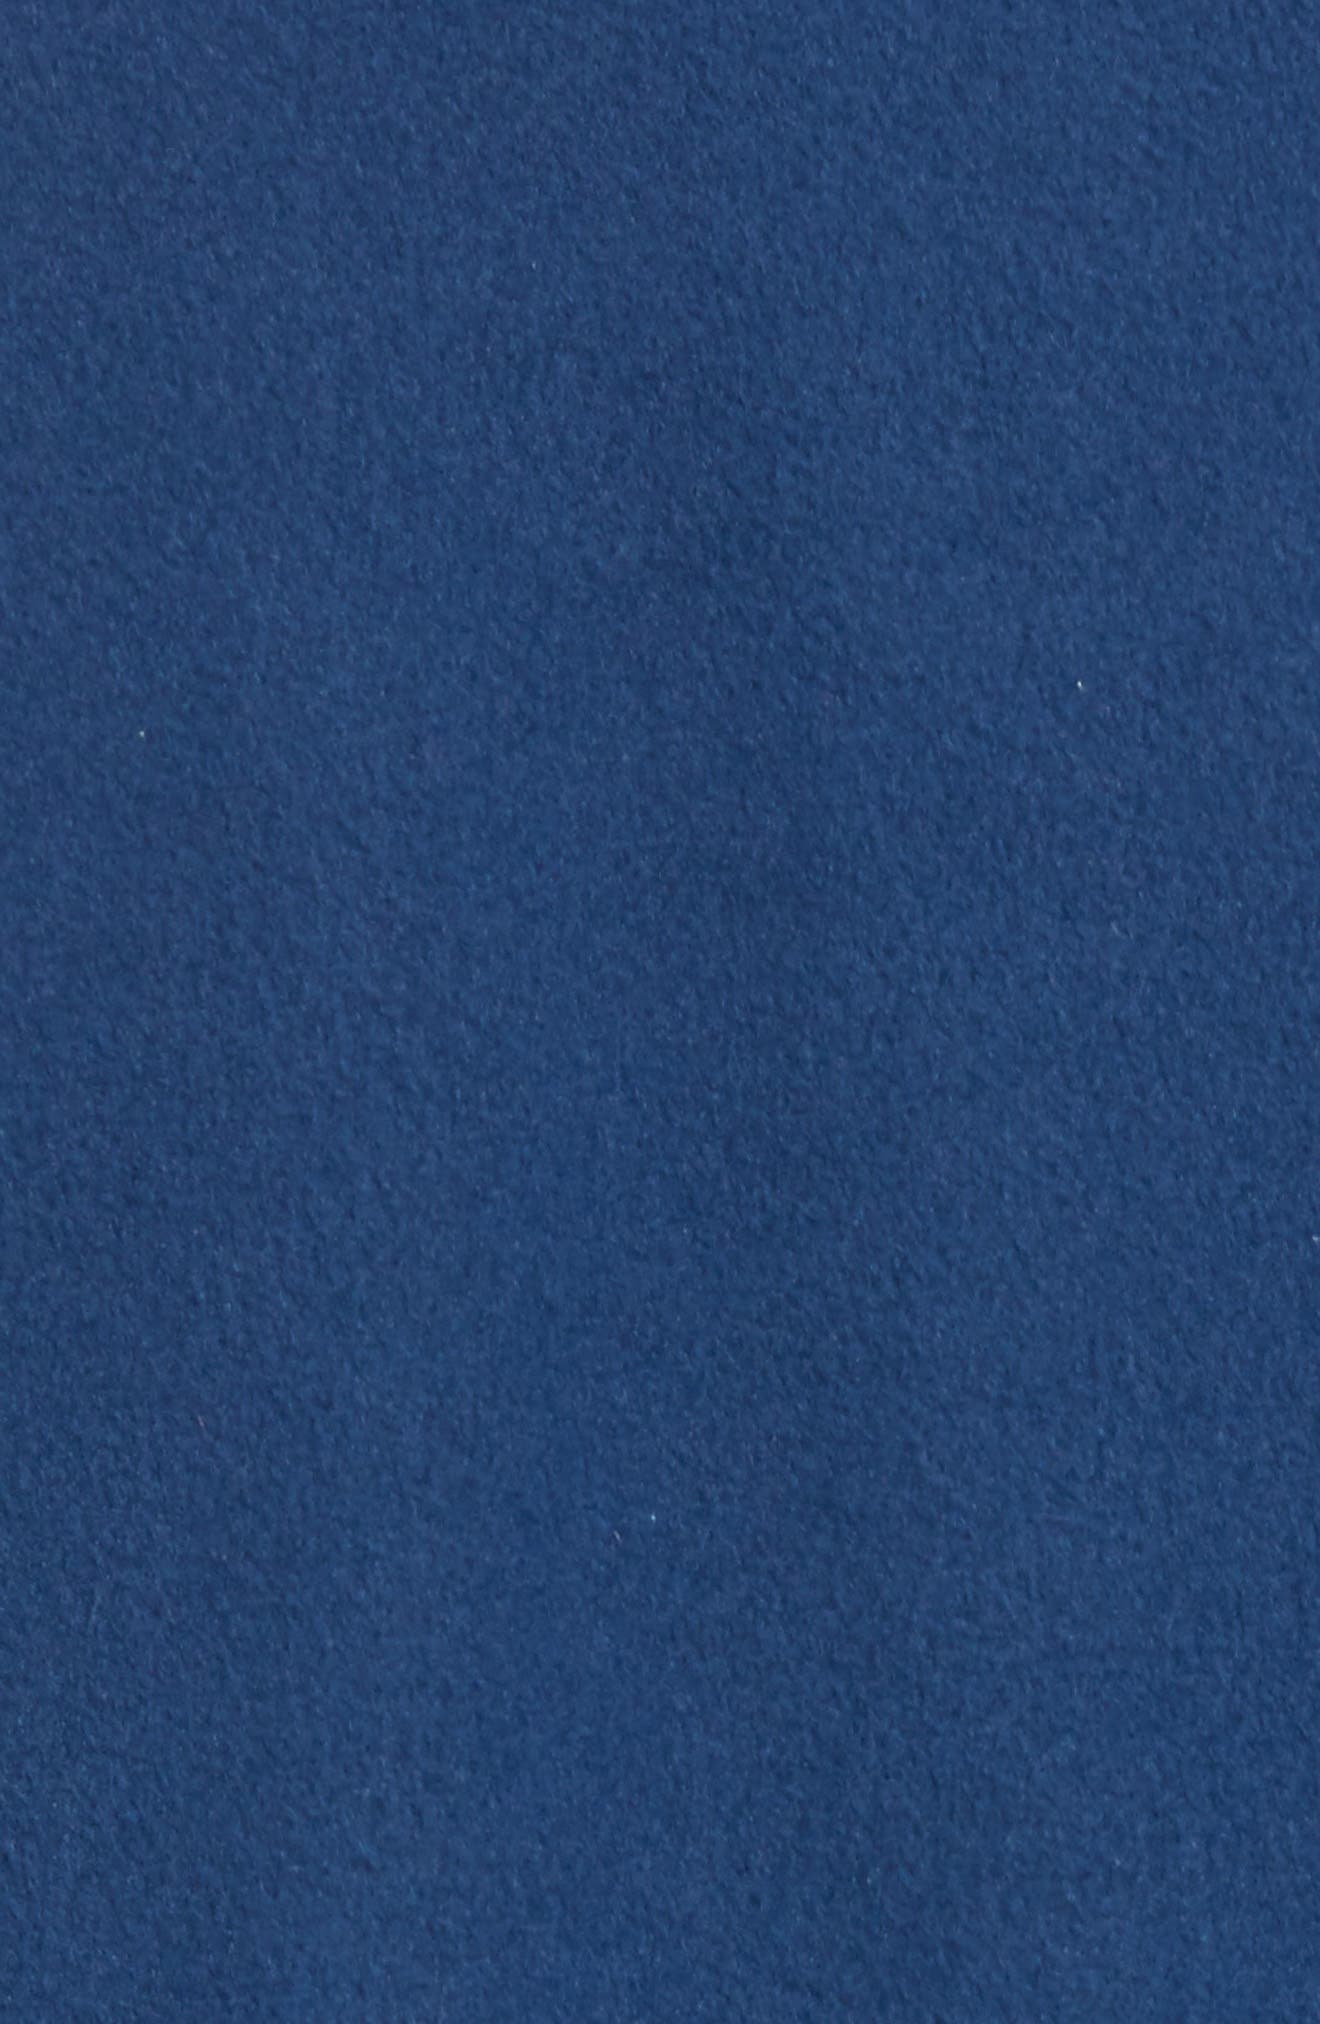 Fleece Pullover,                             Alternate thumbnail 5, color,                             STONE BLUE